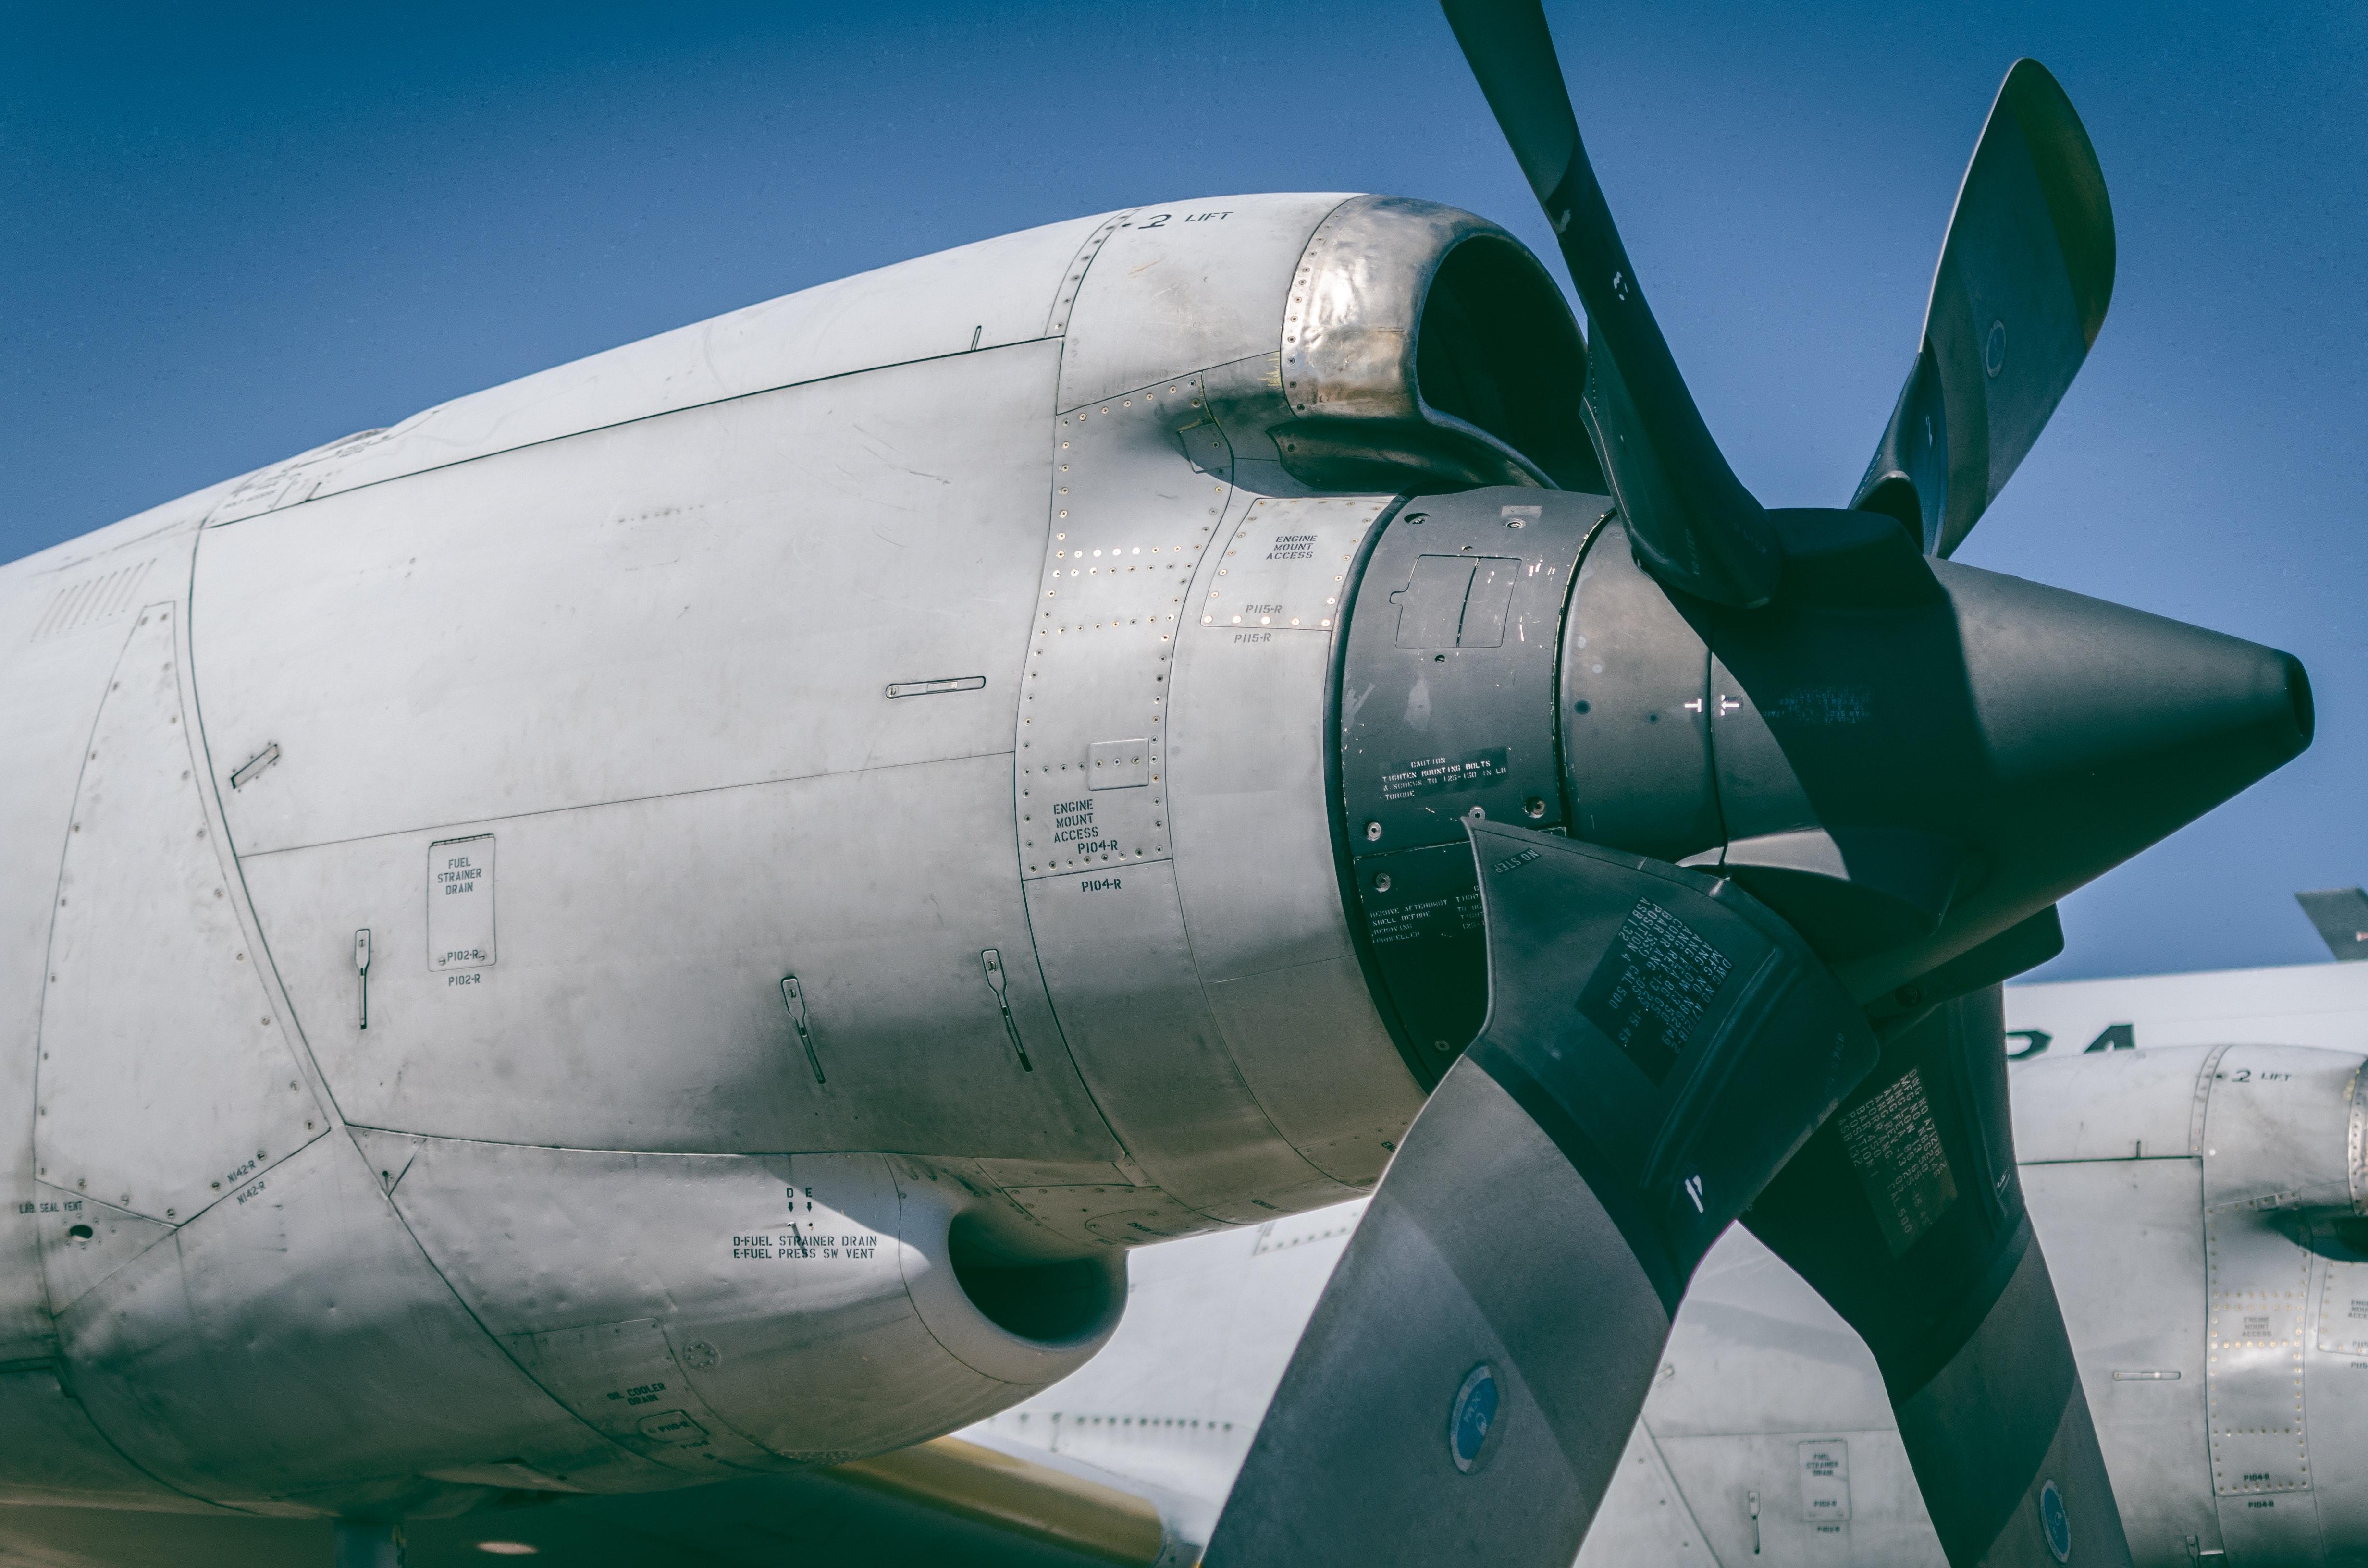 Gray and Black Plane, Aeroplane, Aircraft, Aircraft propellers, Airplane, HQ Photo